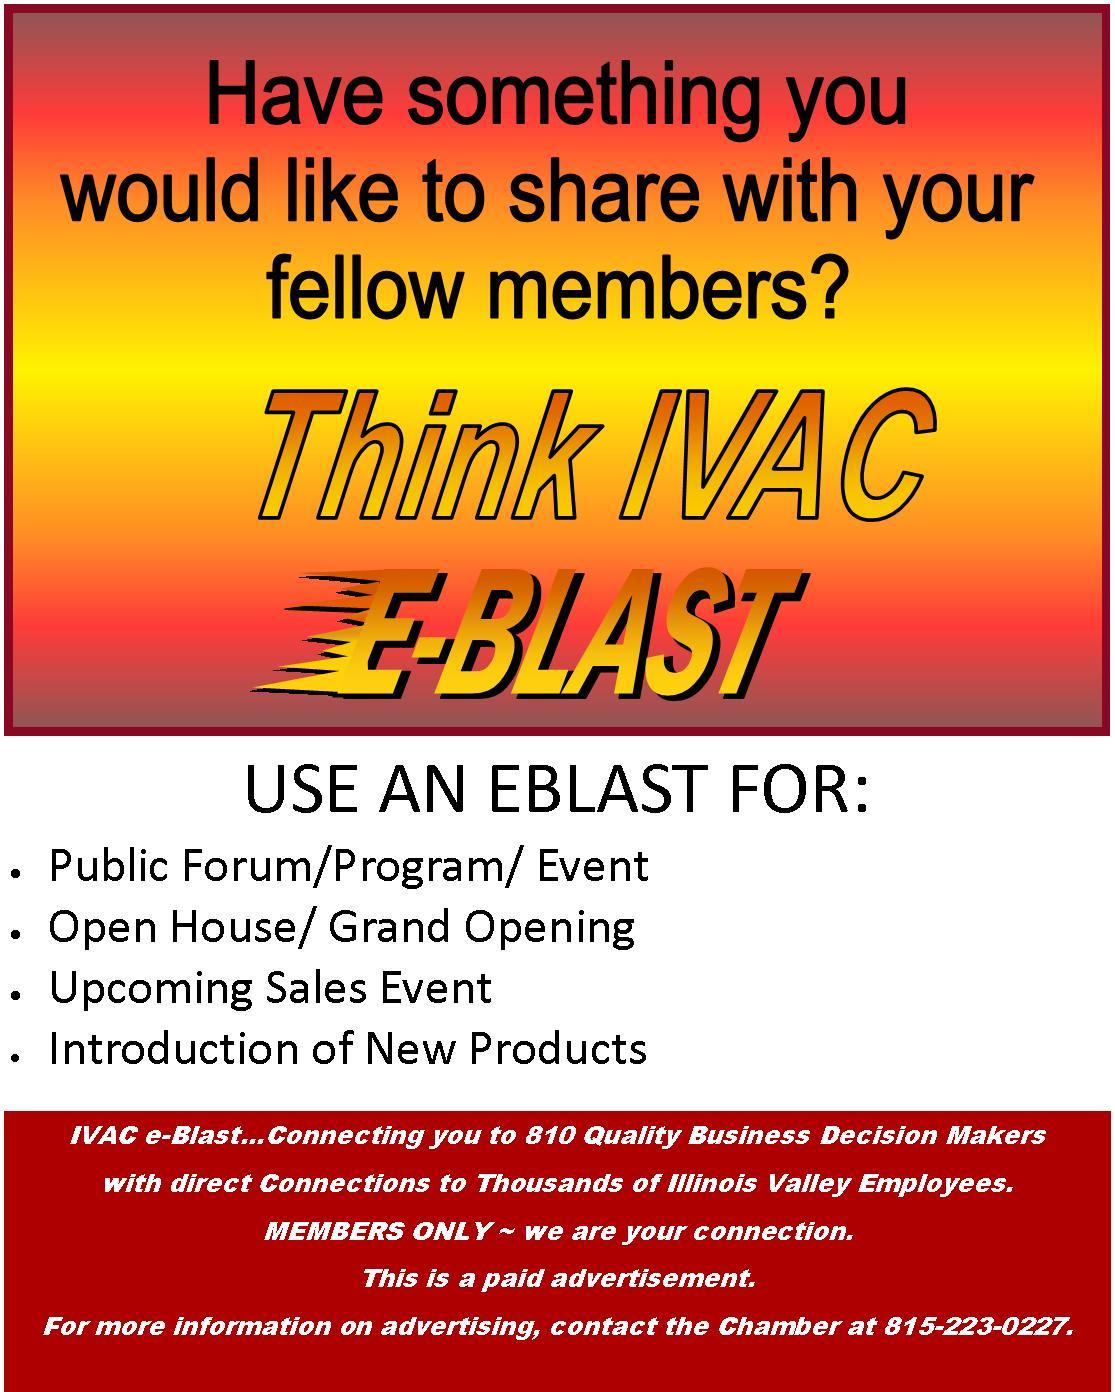 Member to Member eBlast information